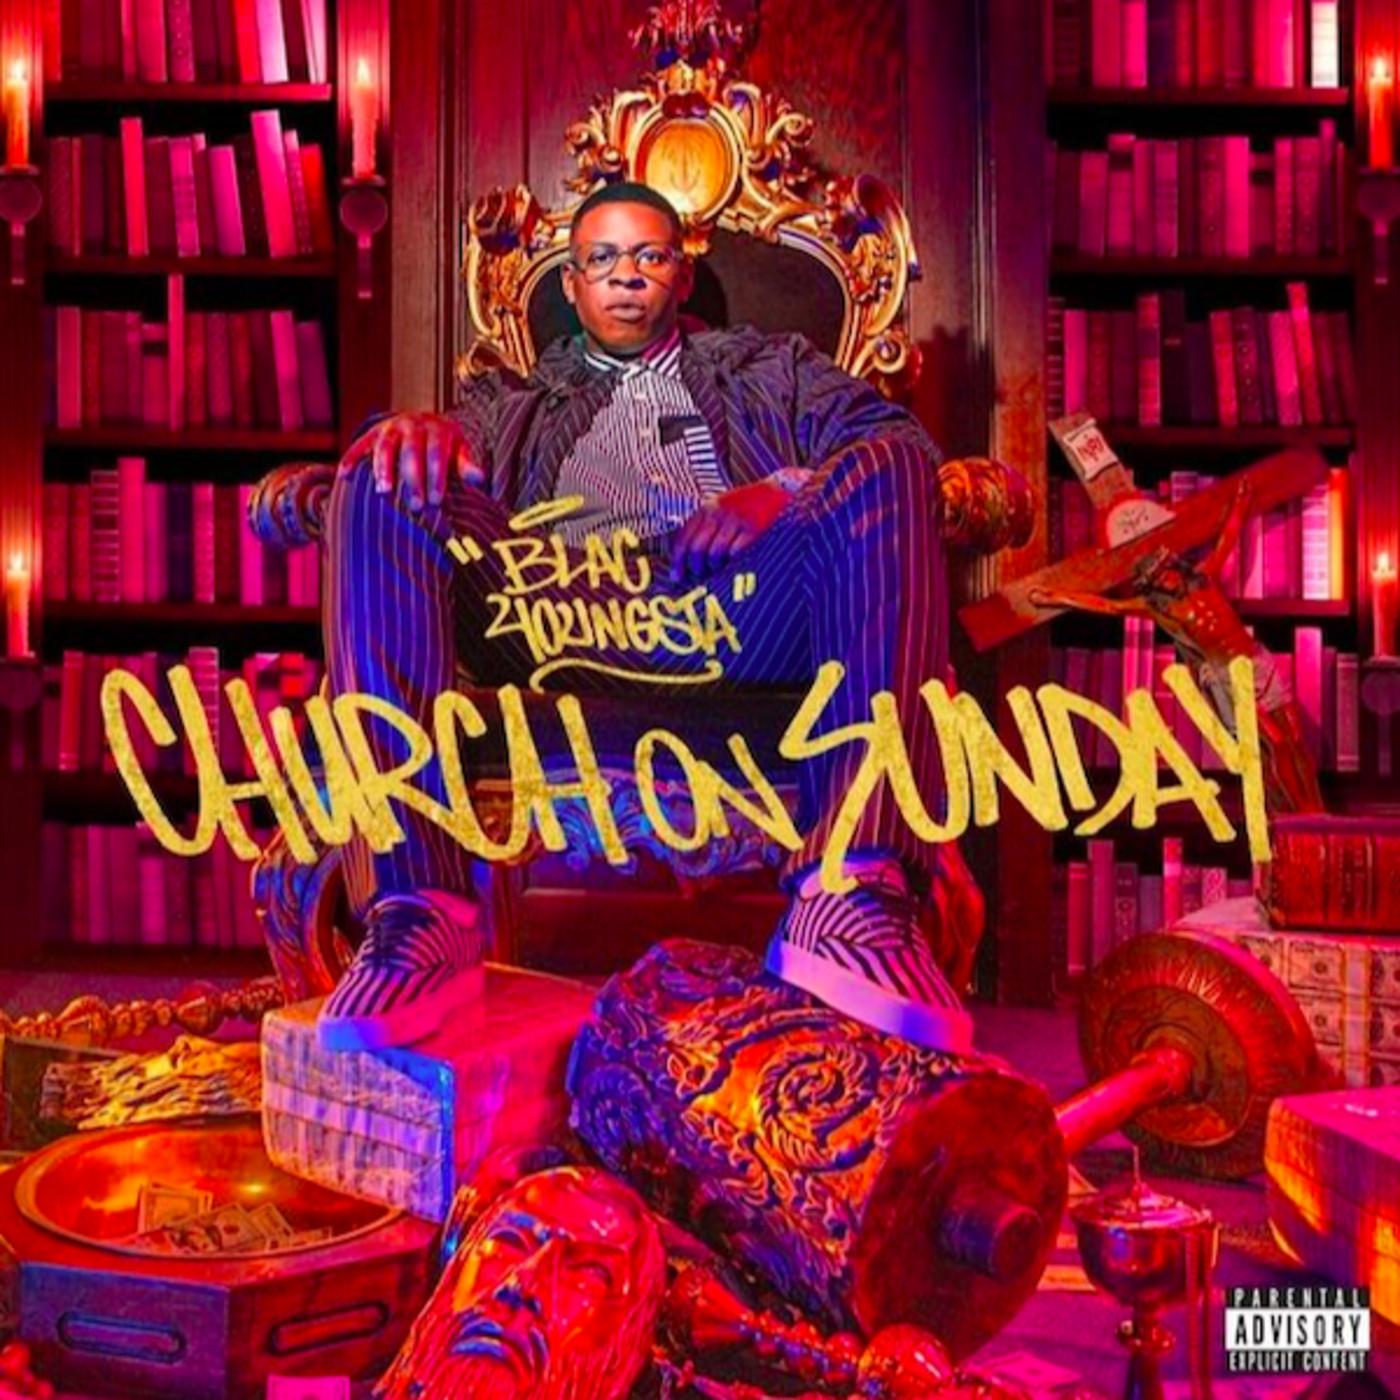 Blac Youngsta 'Church on Sunday'